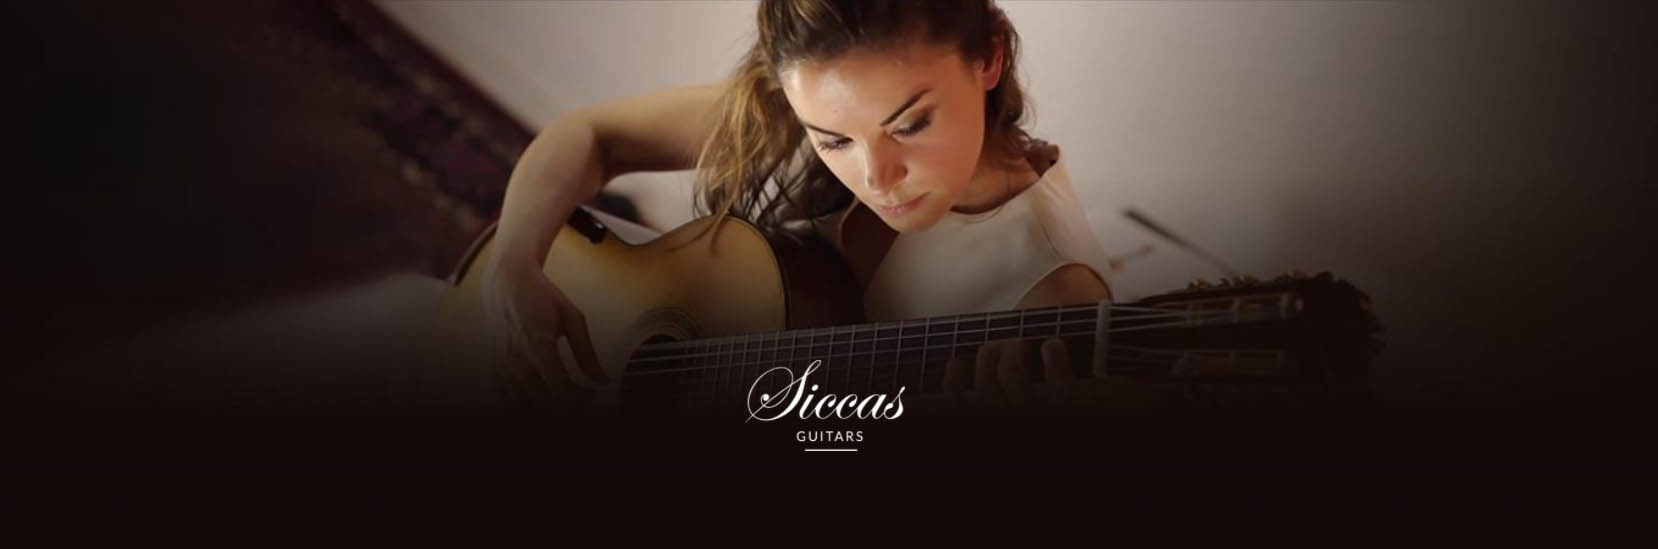 Siccas Guitars Ana Vidovic